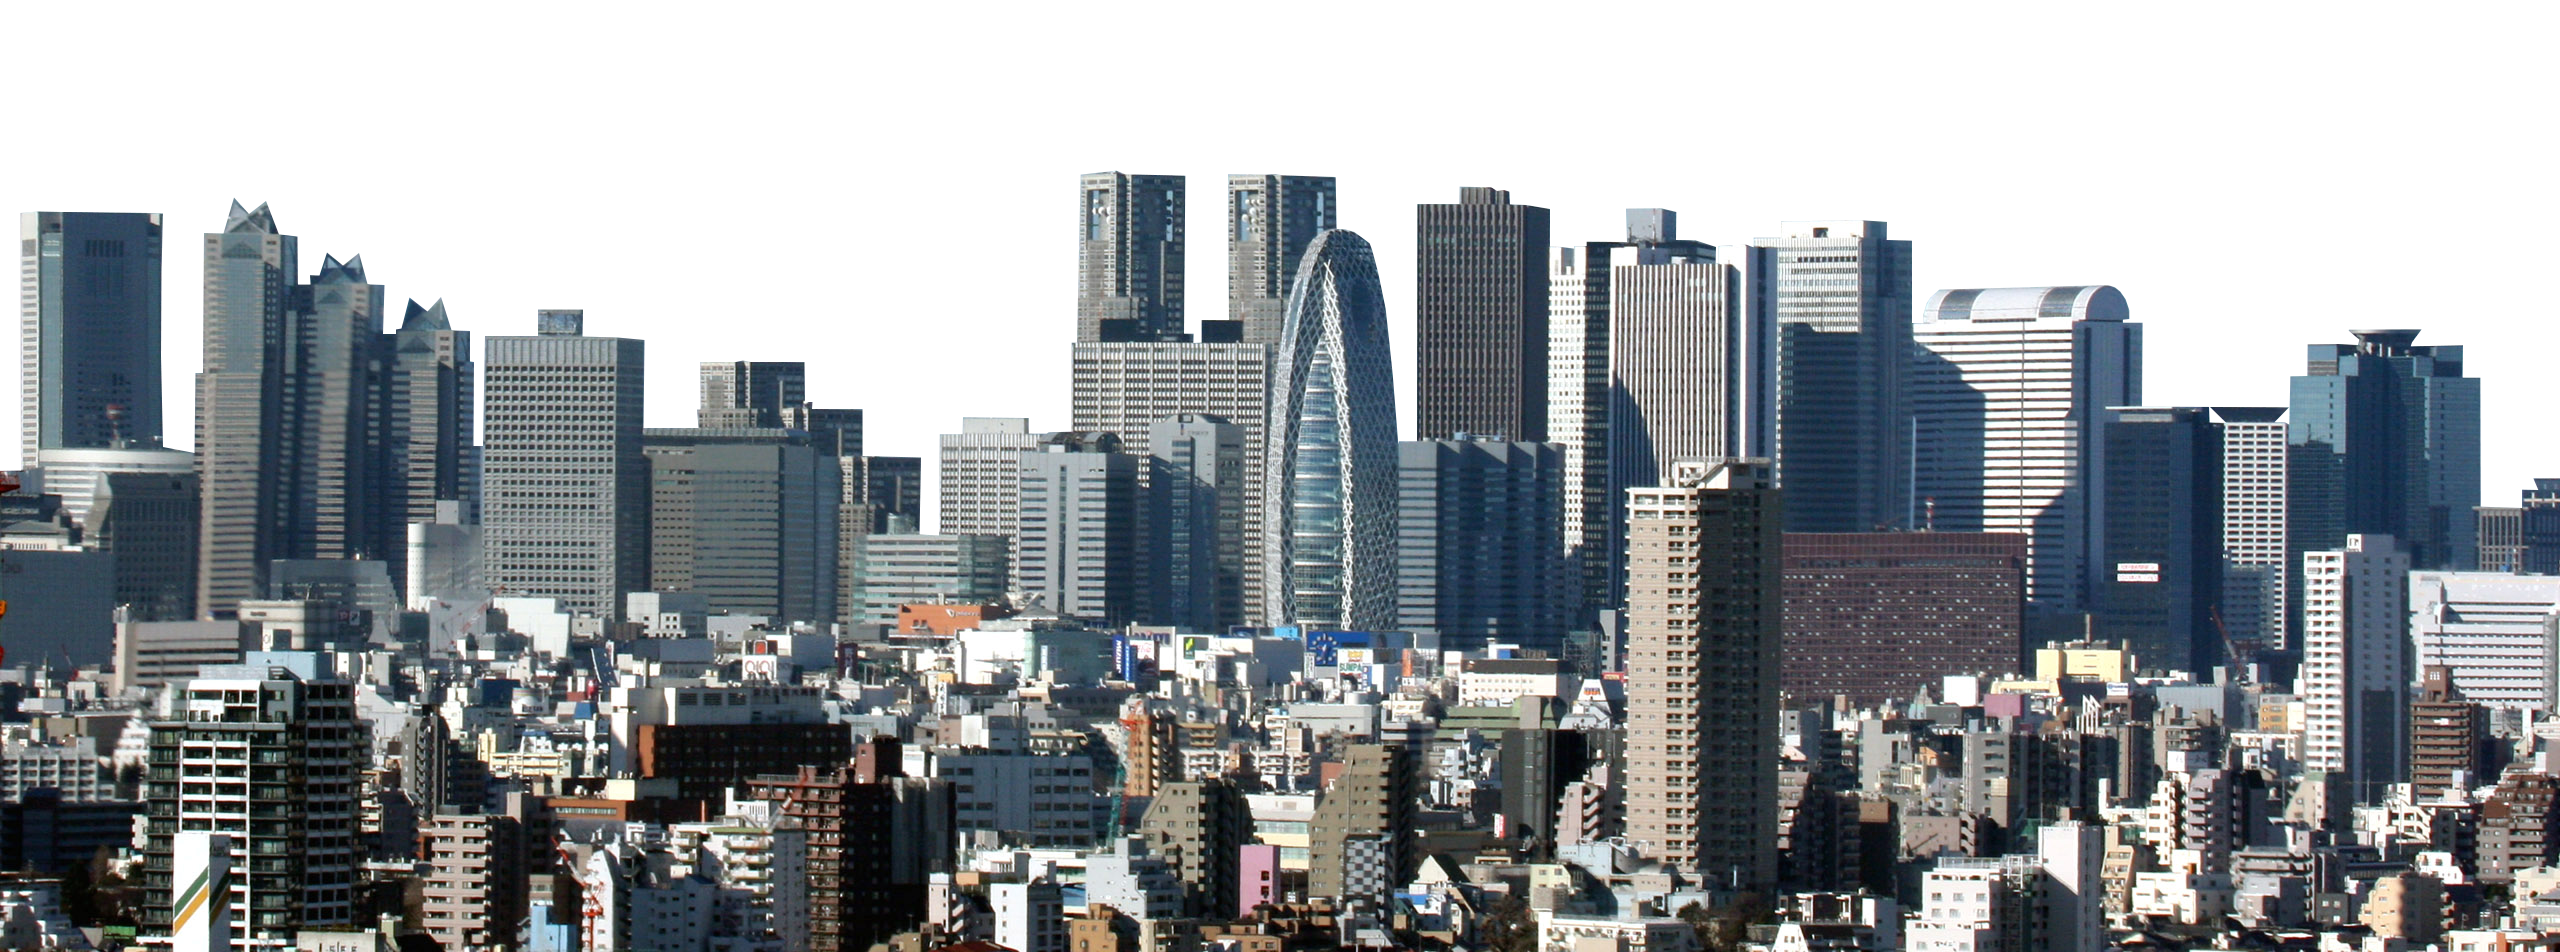 City Skyline PNG Image.